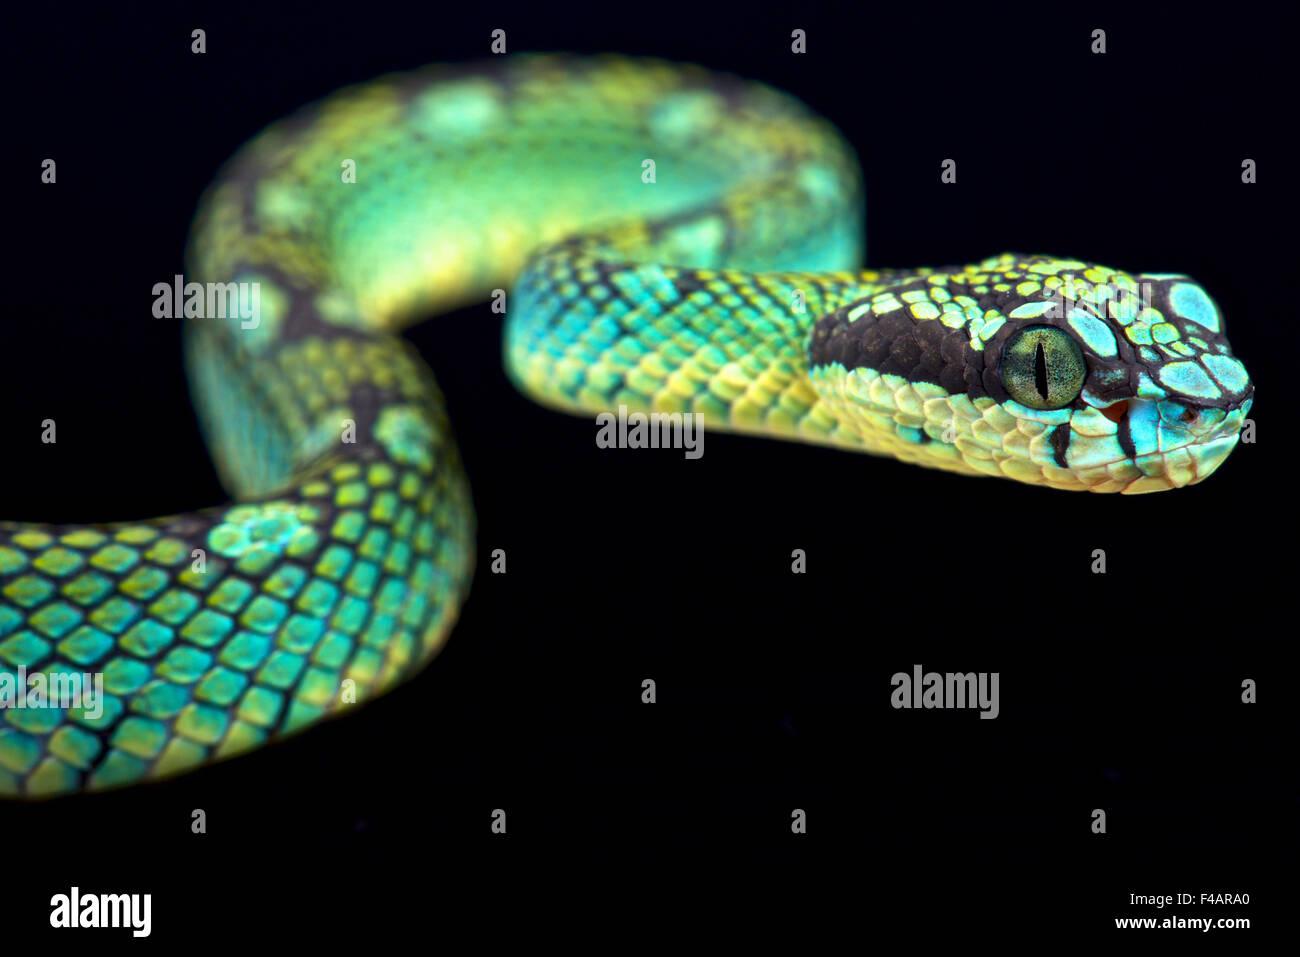 Sri Lankan pit viper (Trimeresurus trigonecephalus) - Stock Image